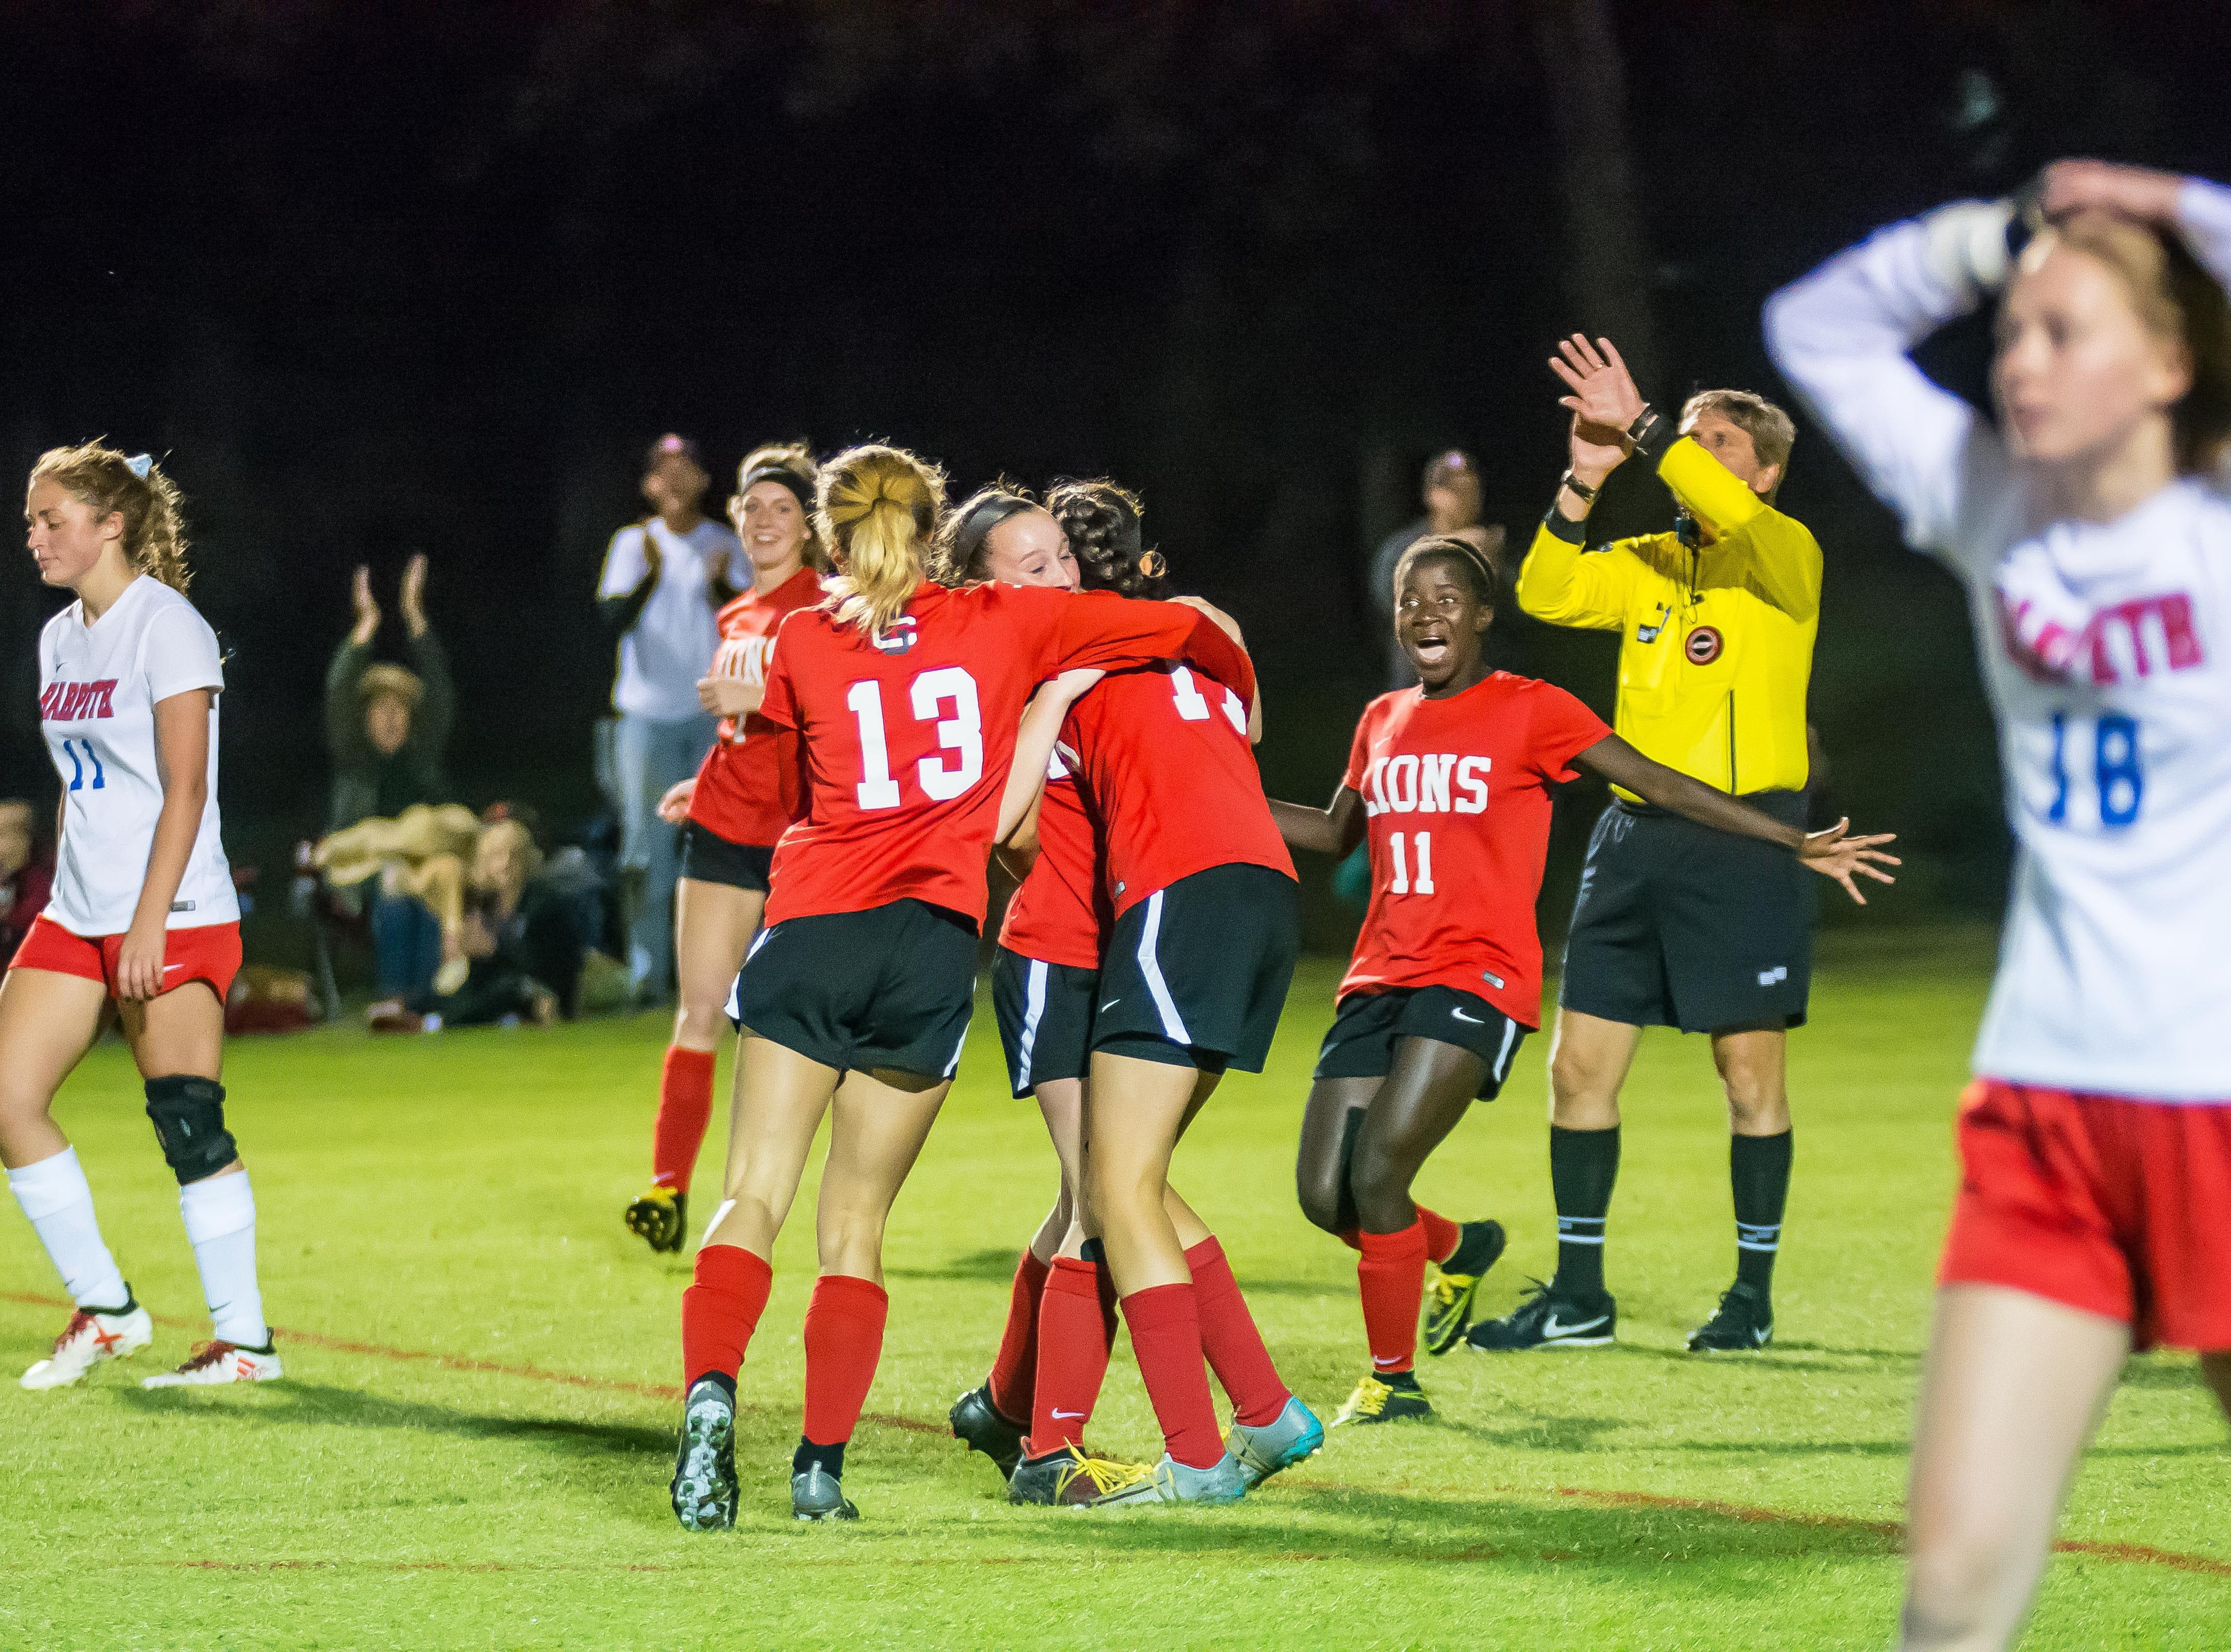 Grace Christian celebrates a goal.